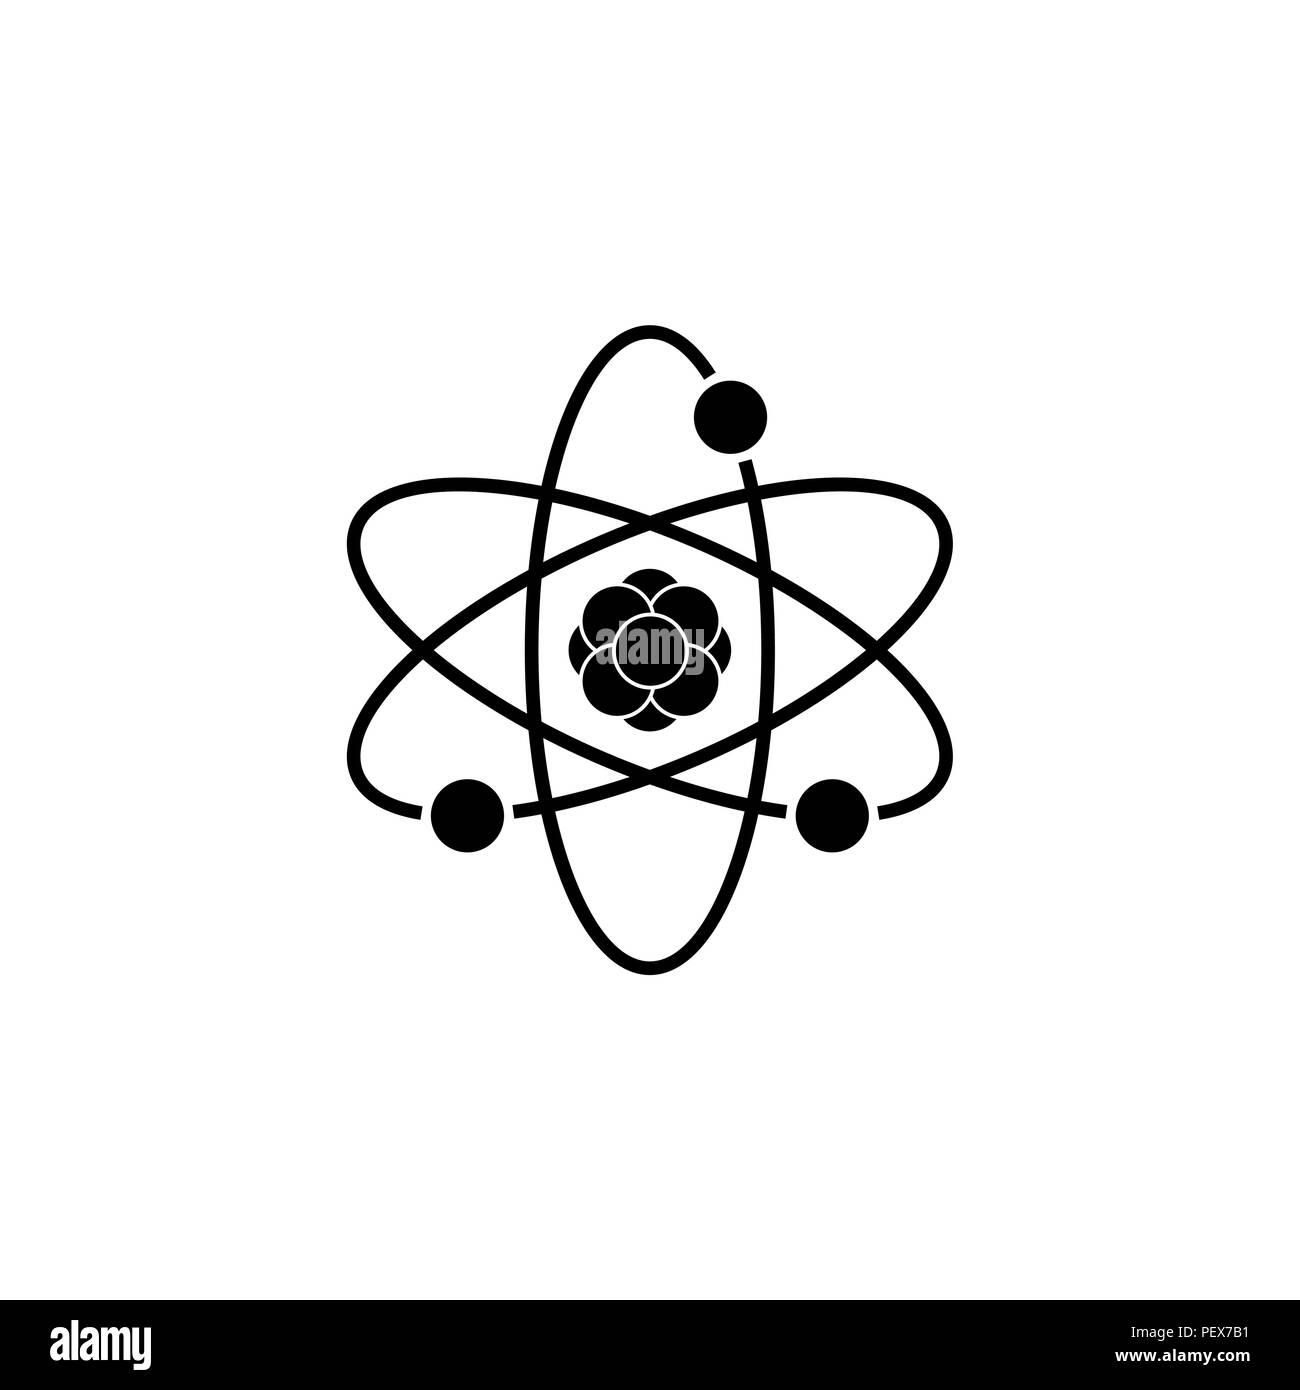 Pictograph of atom vector illustration black on white background